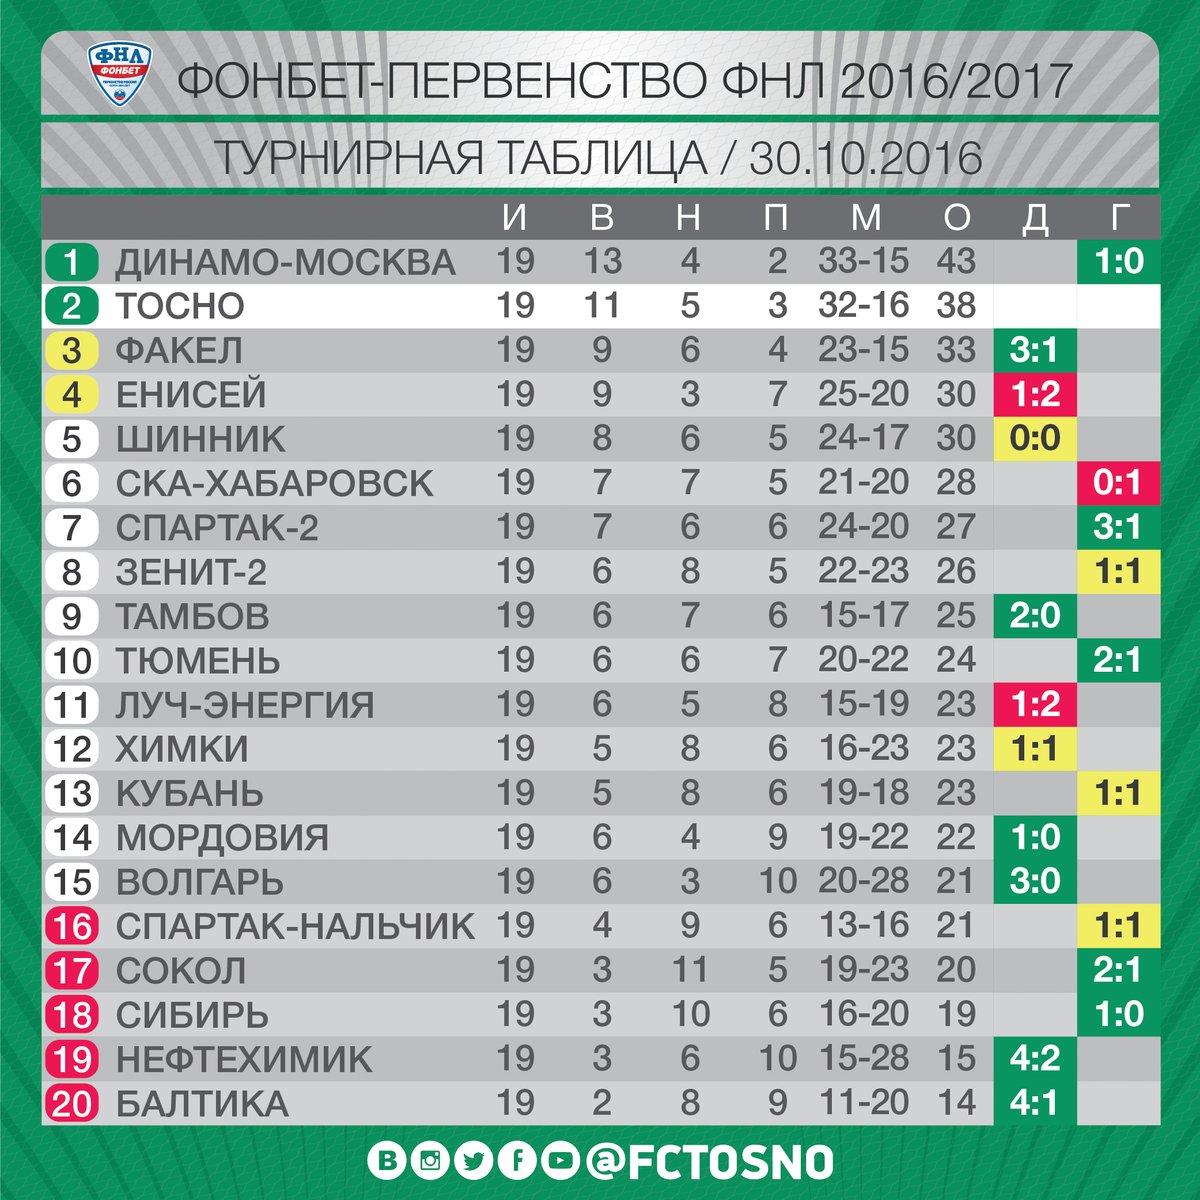 турнирная фнл тур таблица россии 15 2014-2015 футбол